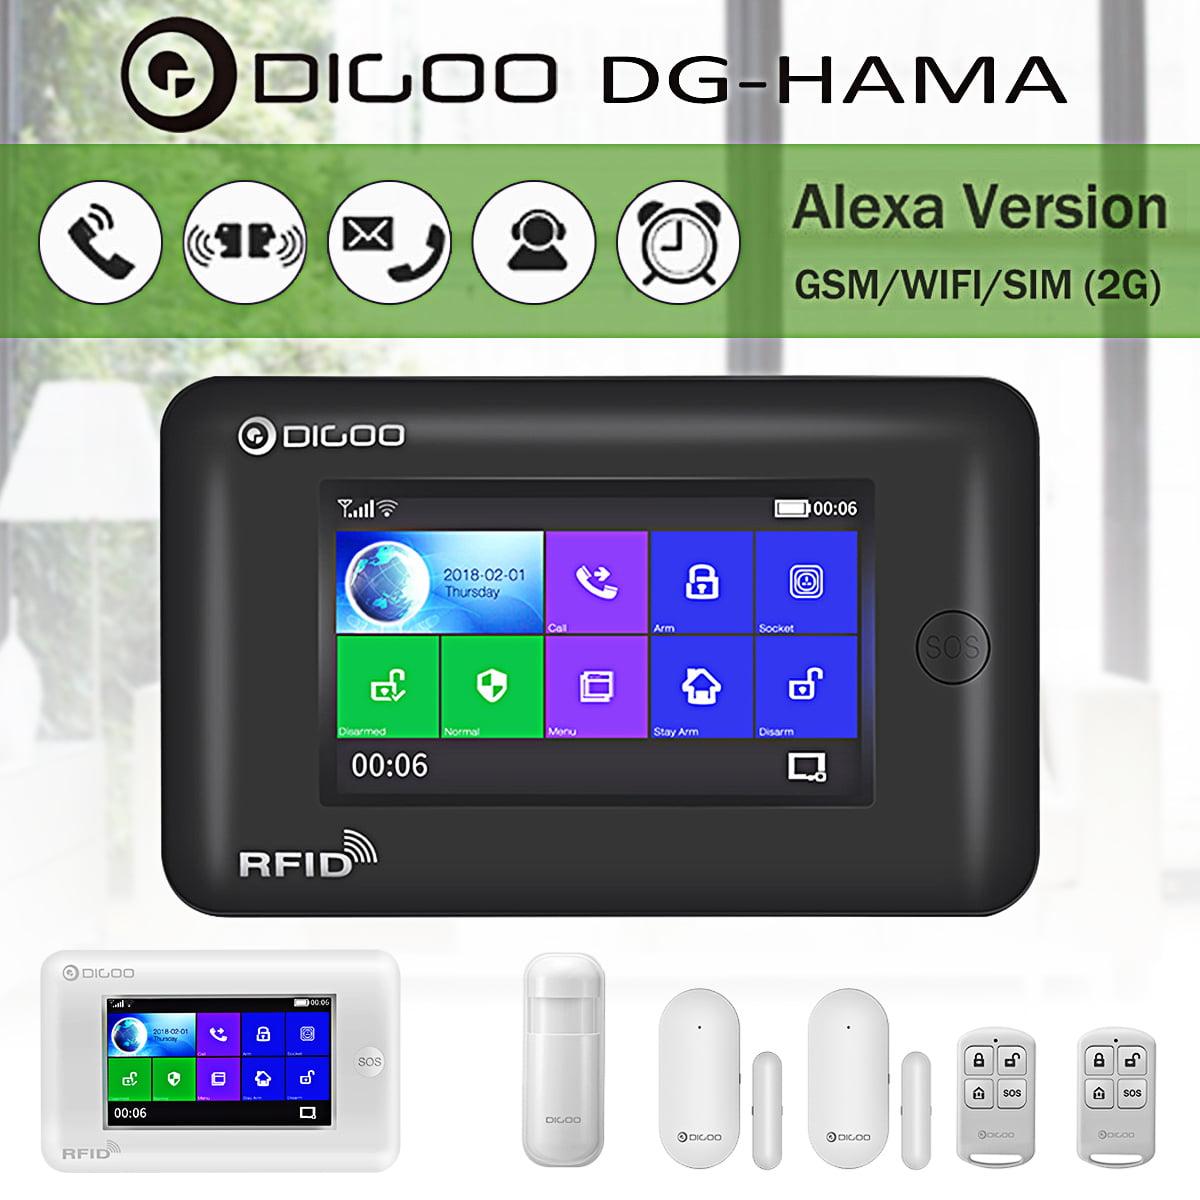 DIGOO DG-HAMA Touch Screen 433MHz GSM WIFI DIY Smart Home Burglar Security Alarm Alert System Accessories,Auto Dial Call SMS Message Push,Phone APP Control PIR Window Door Detector